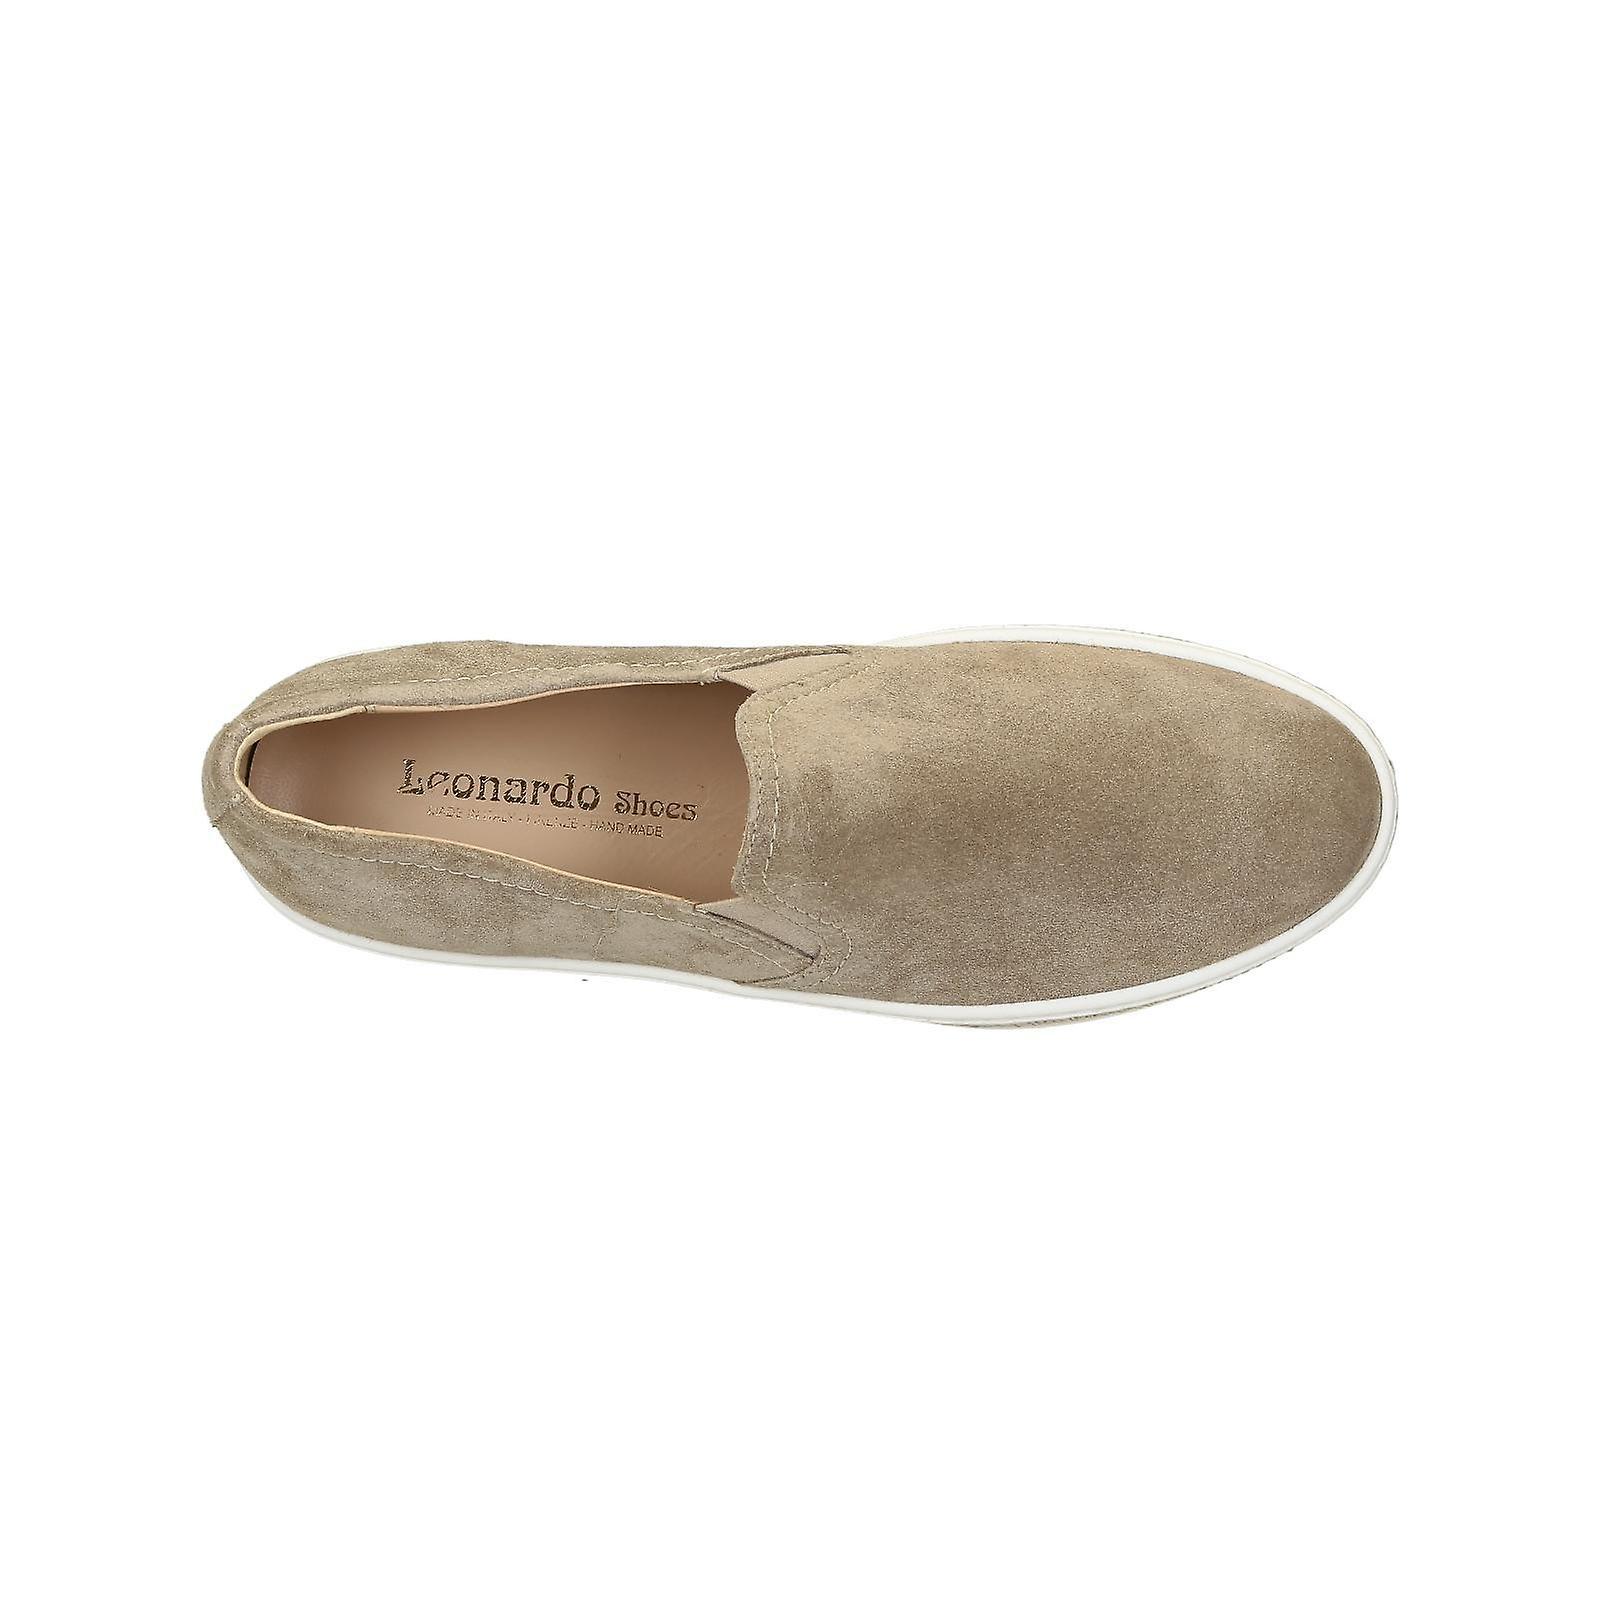 Beige Suede Slip-ons Sneakers With Gold Paiette Platform